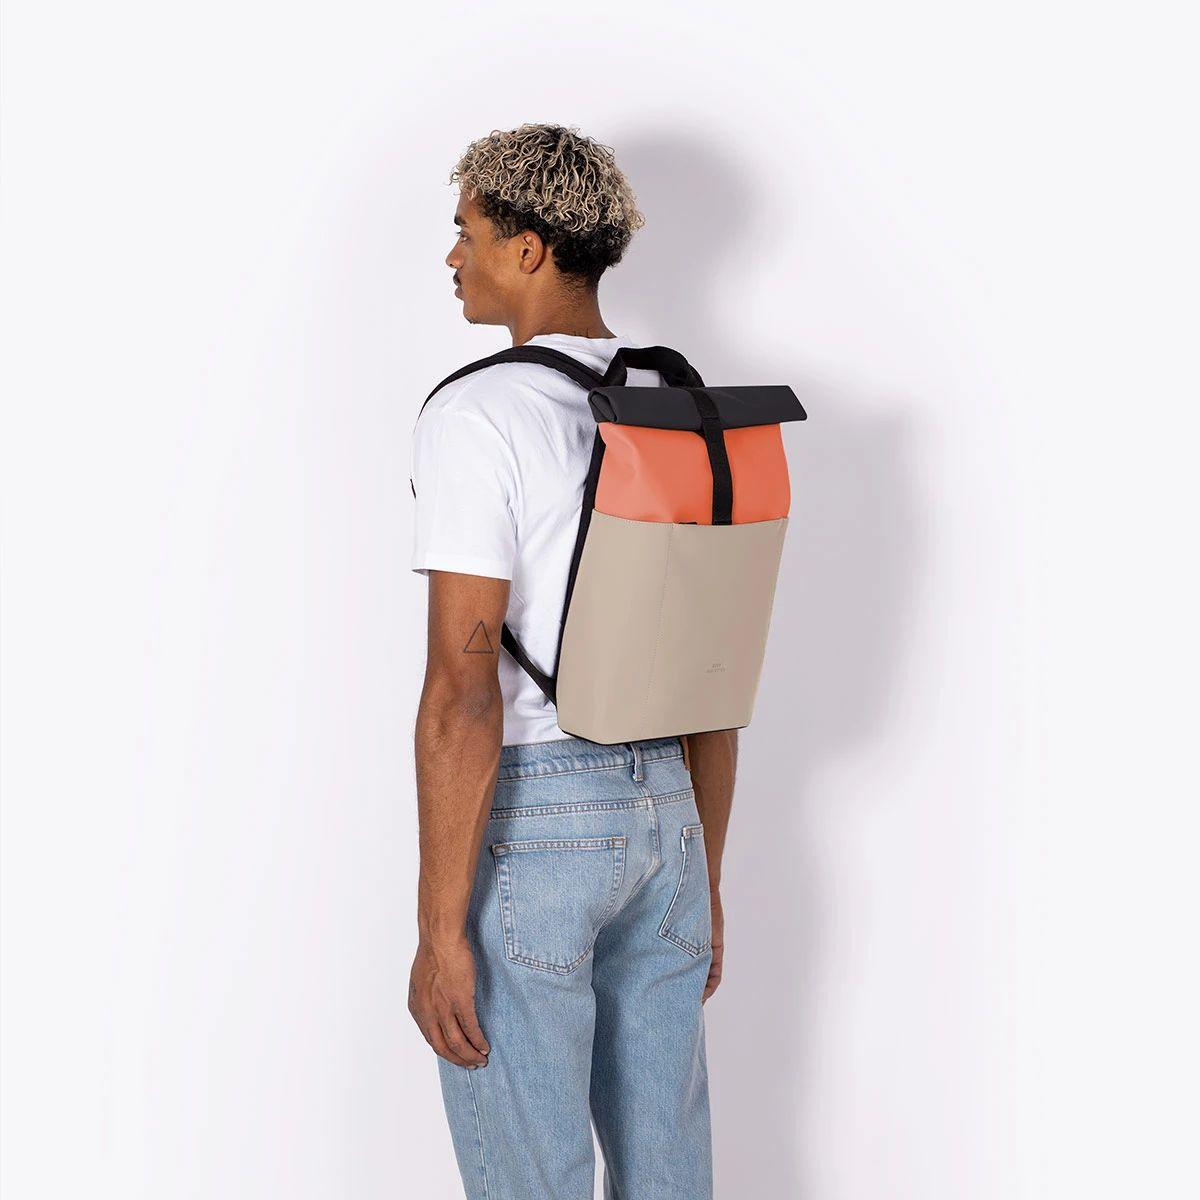 UA_Hajo-Mini-Backpack_Lotus-Series_Coral-Nude_13_2560x